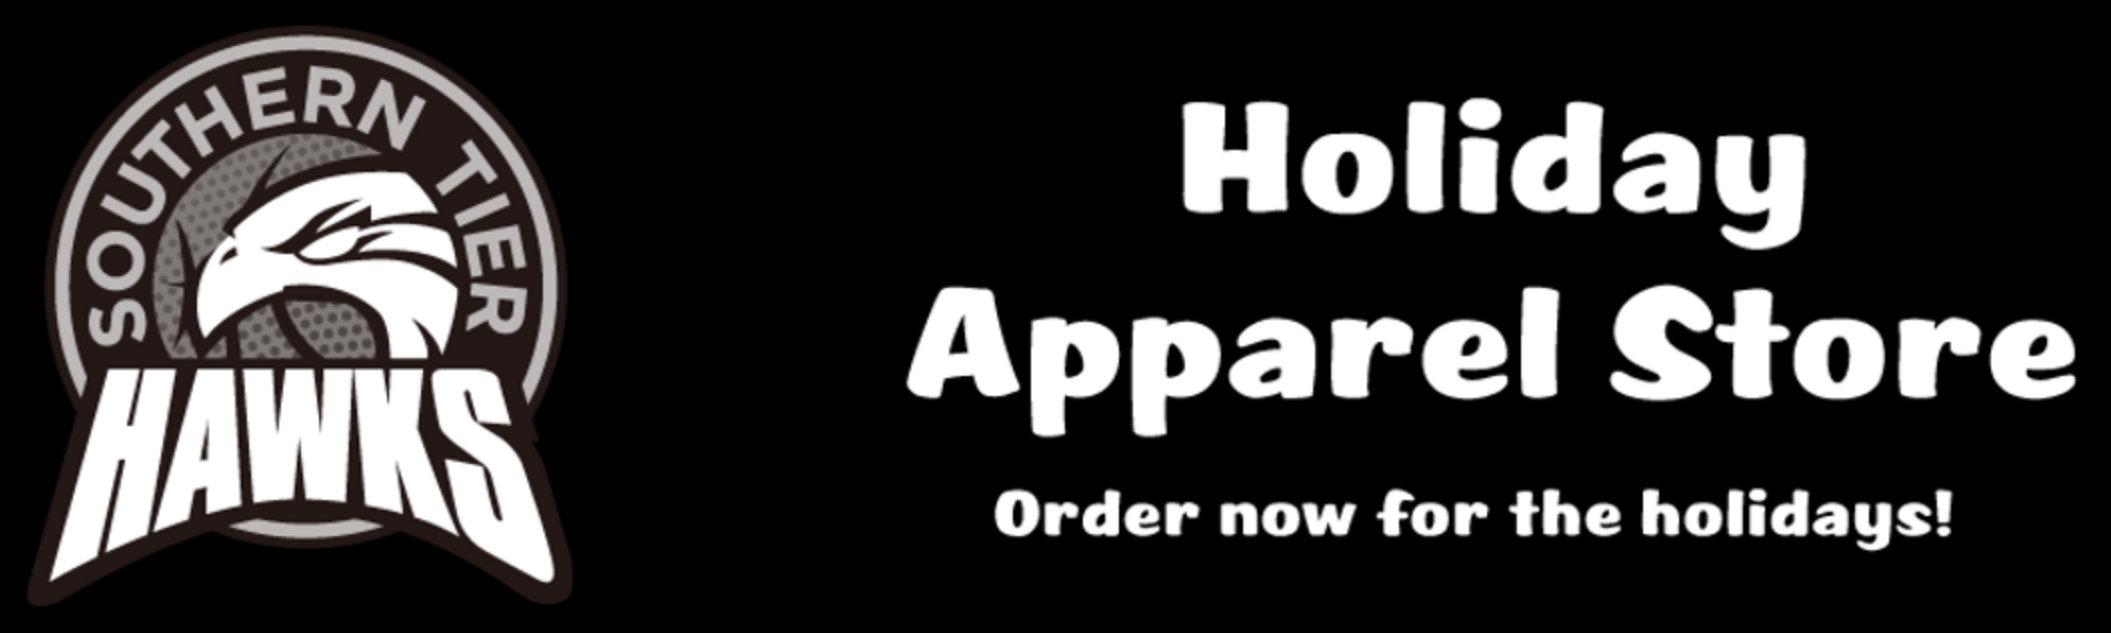 DEADLINE TO ORDER HAWKS APPAREL IS THURSDAY